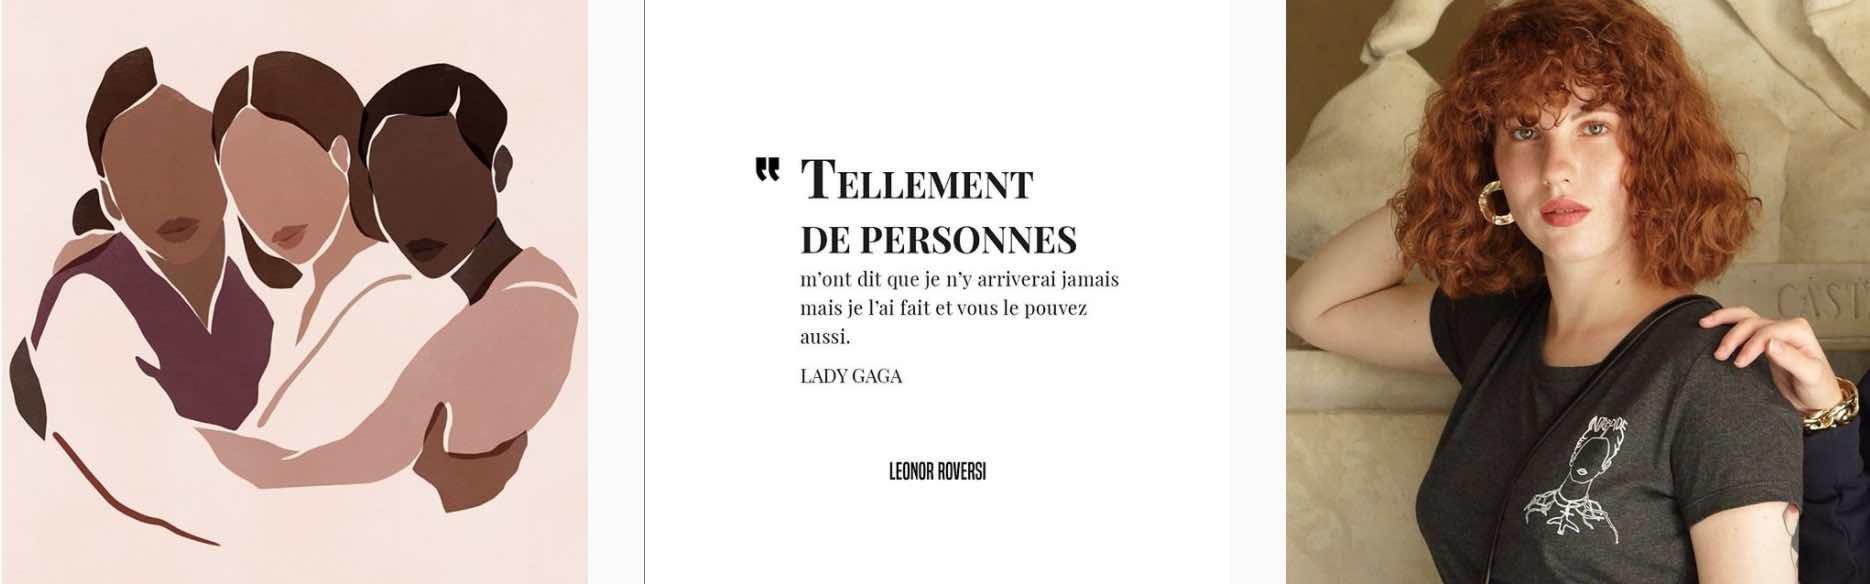 Images de l'instagram de Leonor Roversi